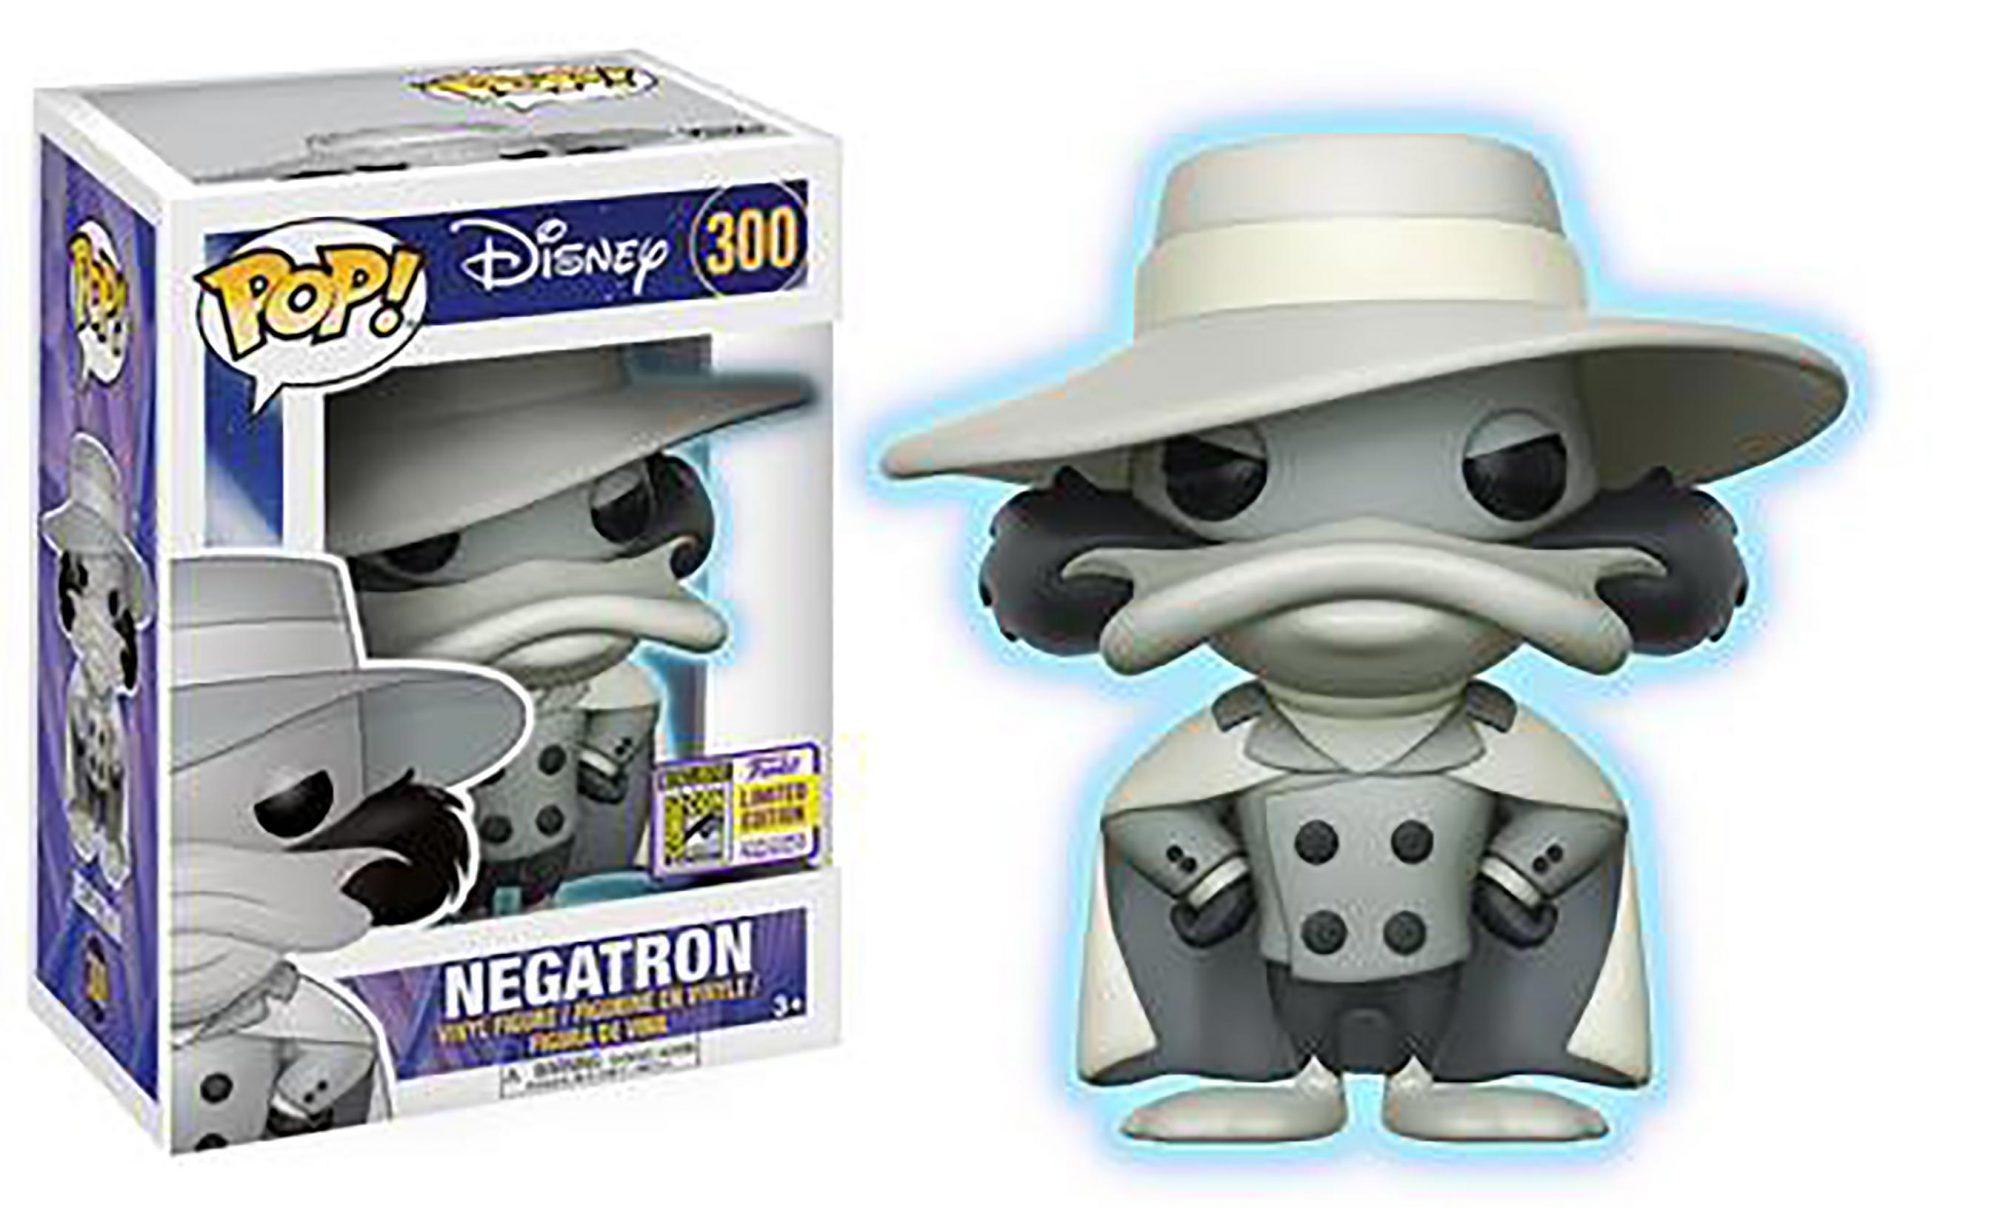 Pop! Disney: Darkwing Duck – Negatron (Glow-in-the-Dark)